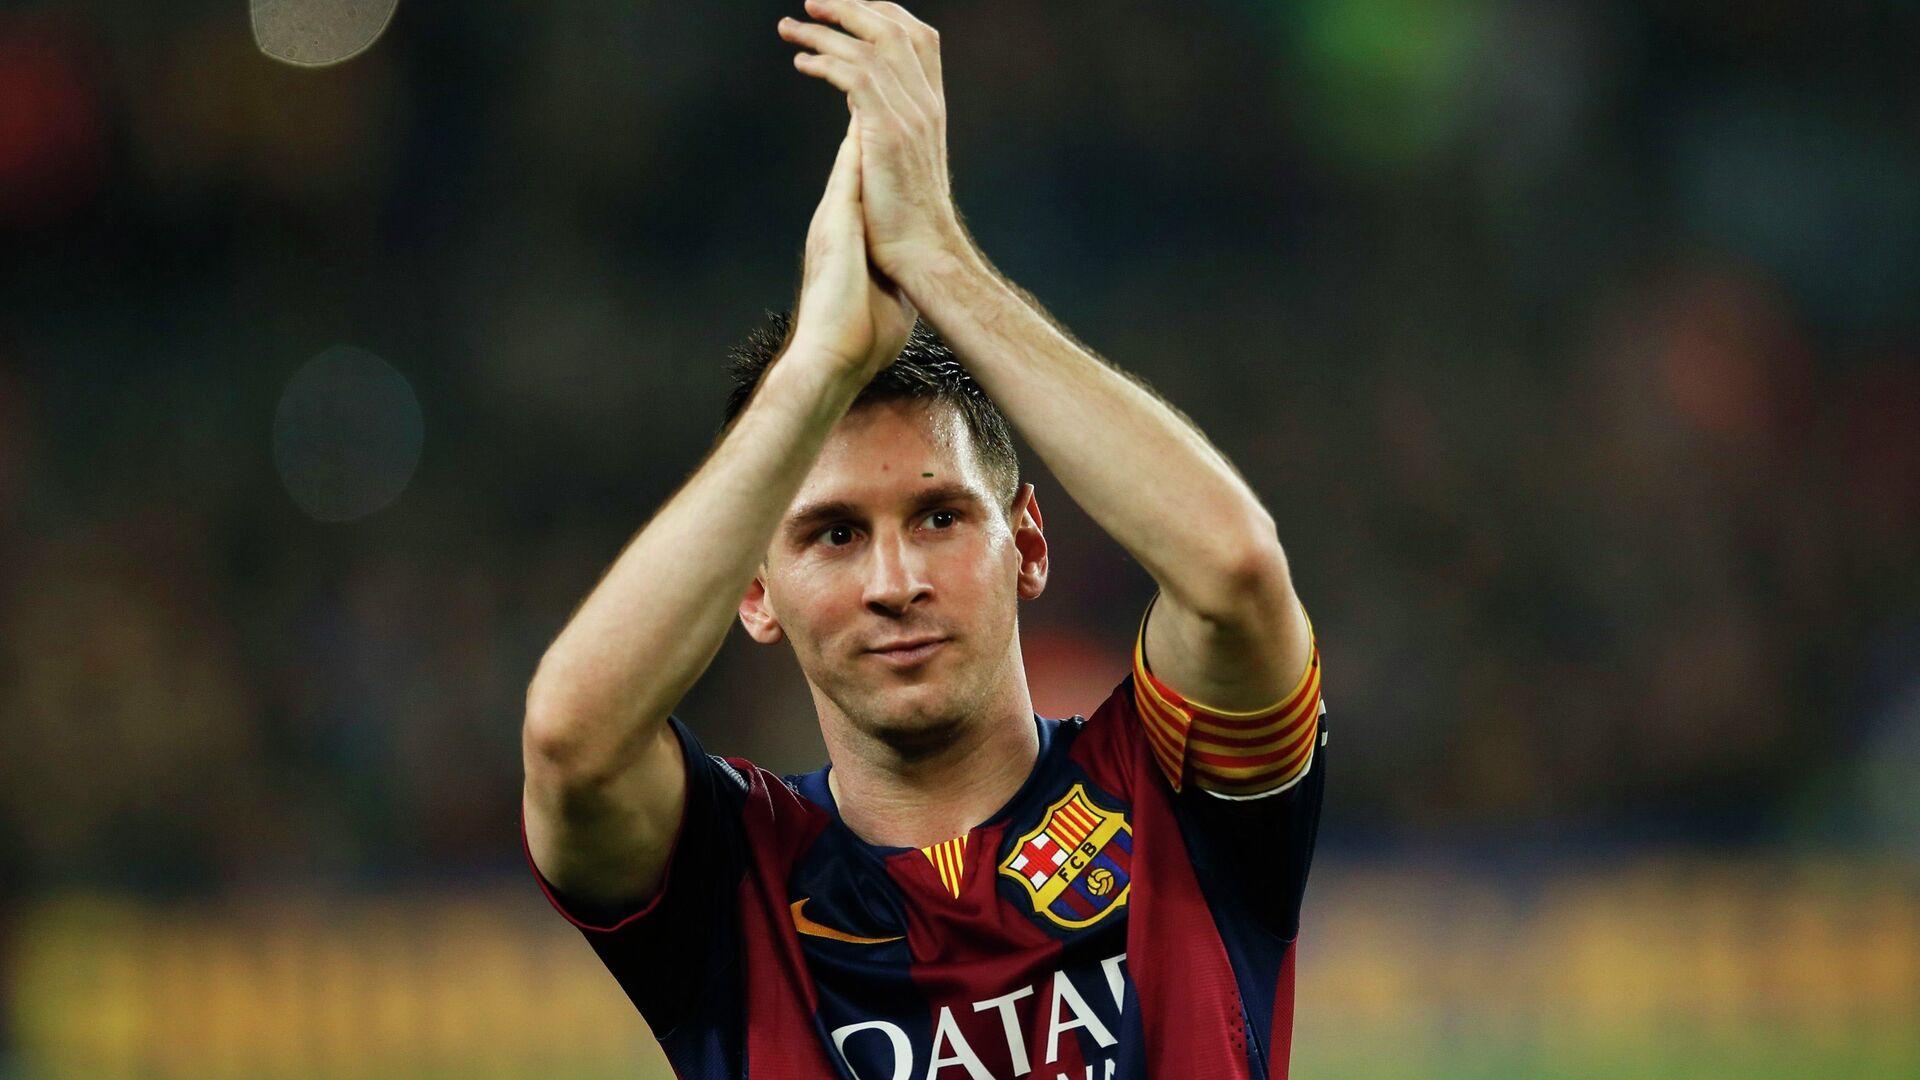 Barcelona's Lionel Messi celebrates at the end of their Spanish first division soccer match against Sevilla at Nou Camp stadium in Barcelona November 22, 2014 - Sputnik Italia, 1920, 05.08.2021